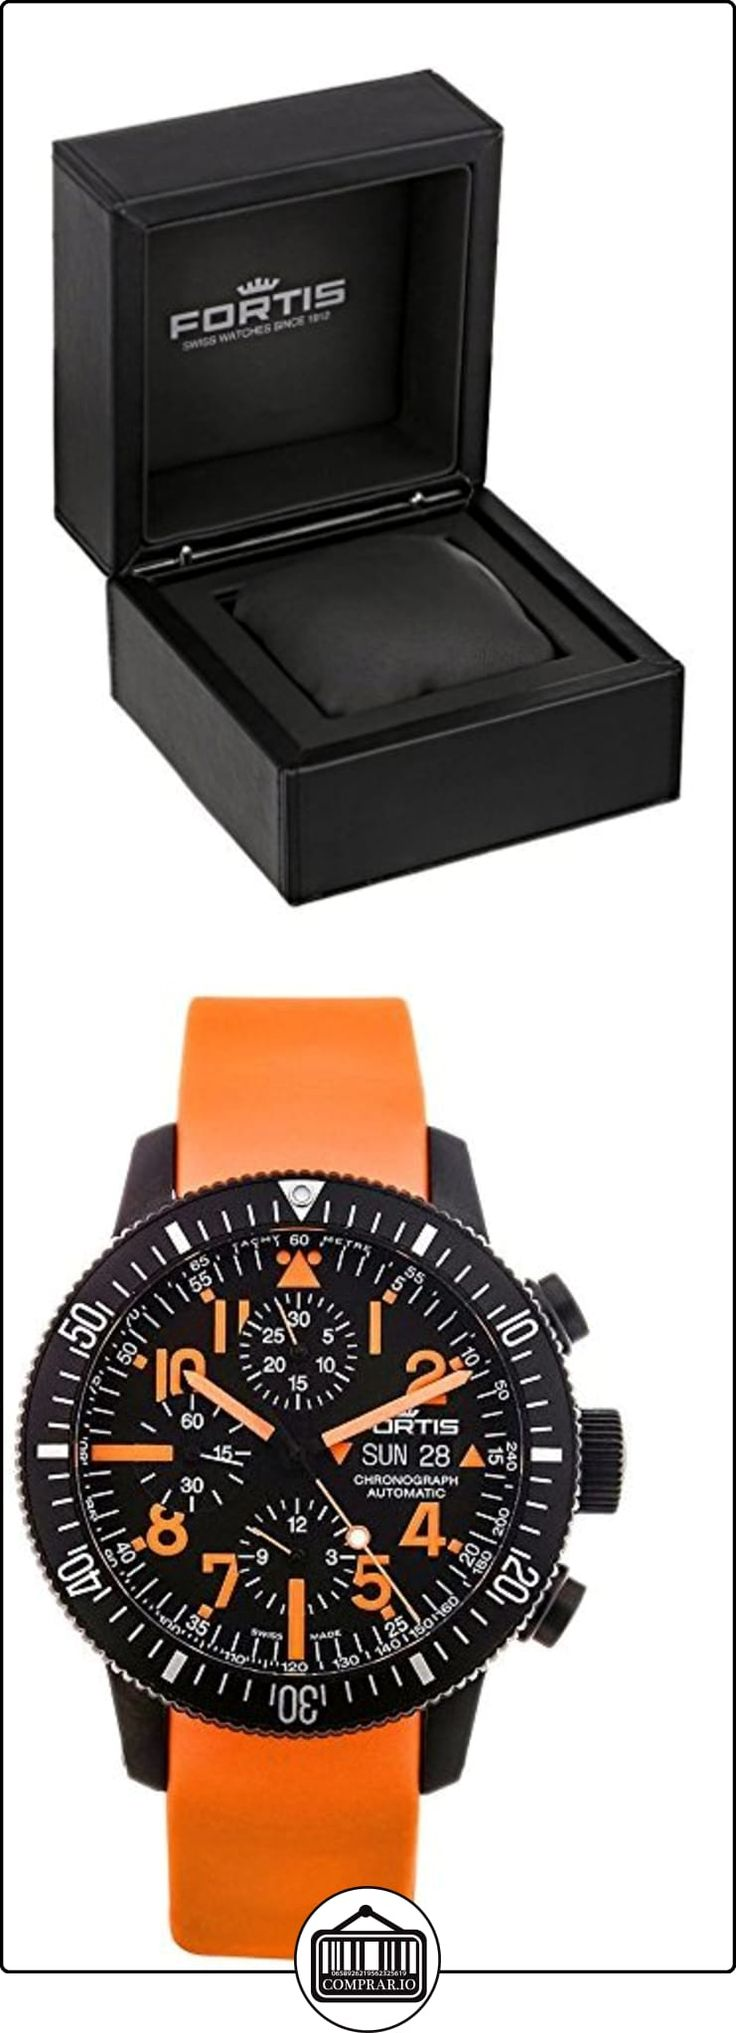 Limited Edition Fortis B-42 Black Mars 500 Automatic Chrono Mens Watch Calendar 638.28.13.SI.19 de  ✿ Relojes para hombre - (Lujo) ✿